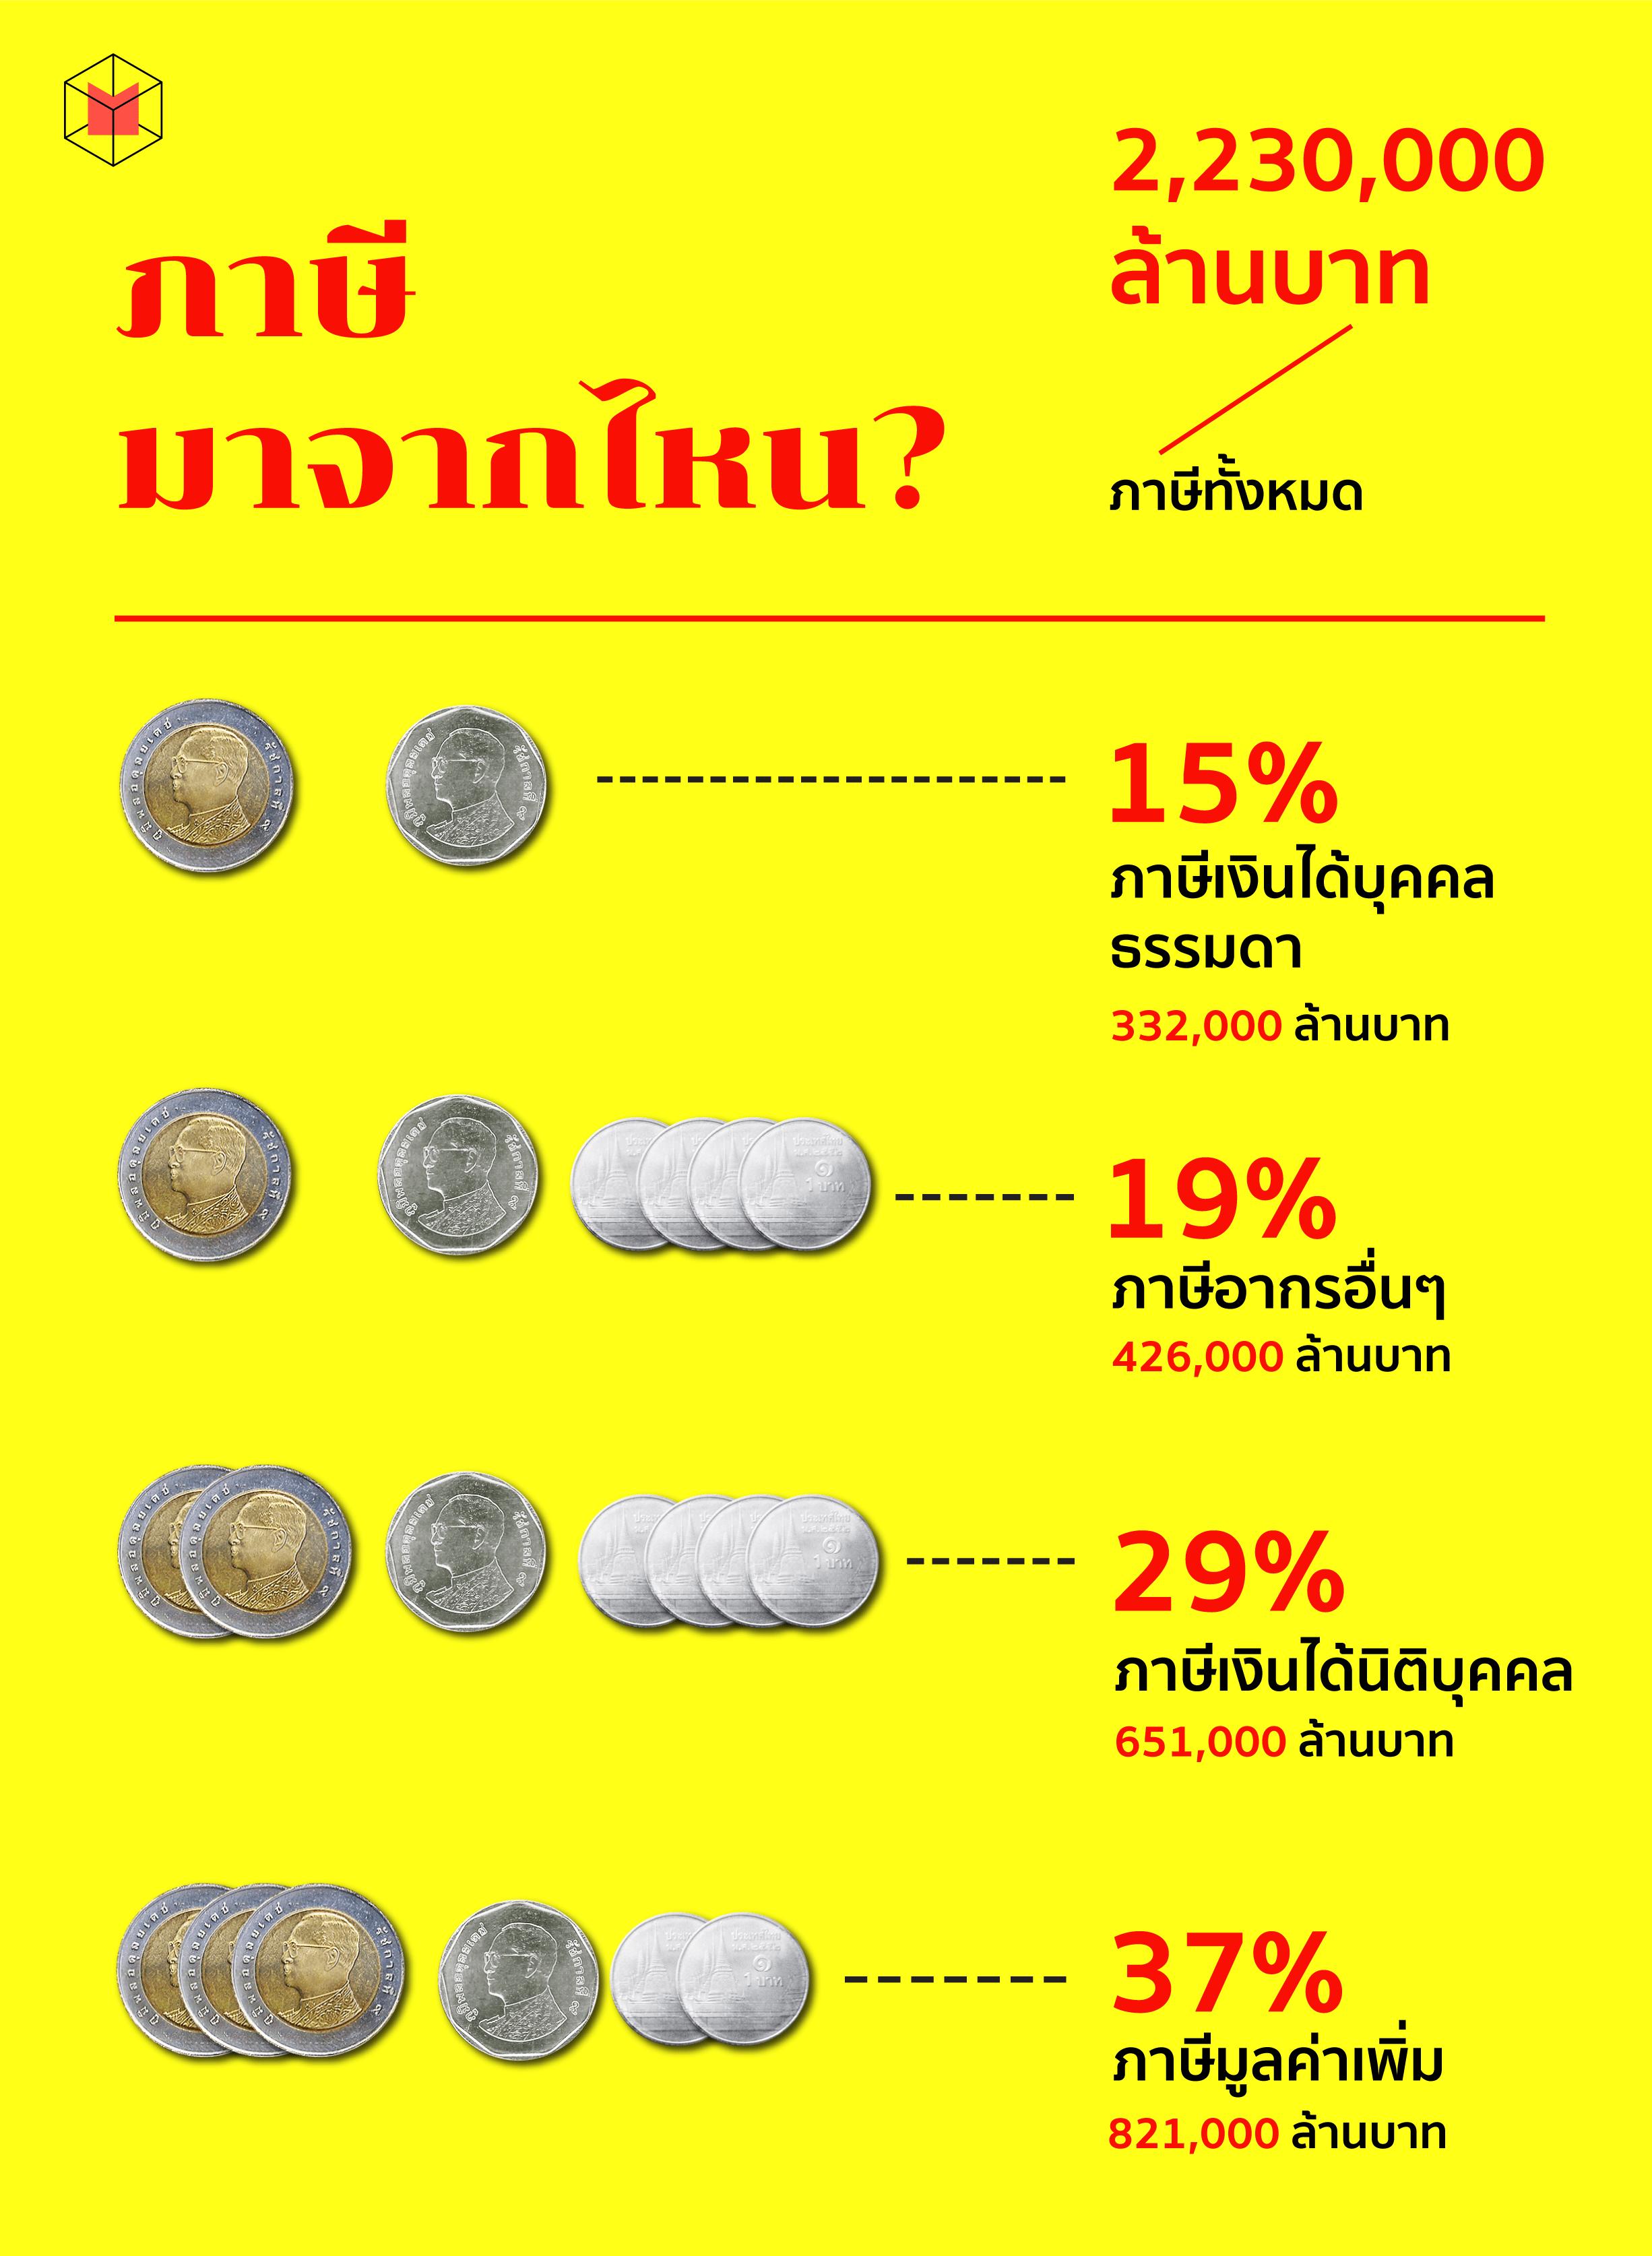 [Image: %E0%B8%A0%E0%B8%B2%E0%B8%A9%E0%B8%B5_1.png]